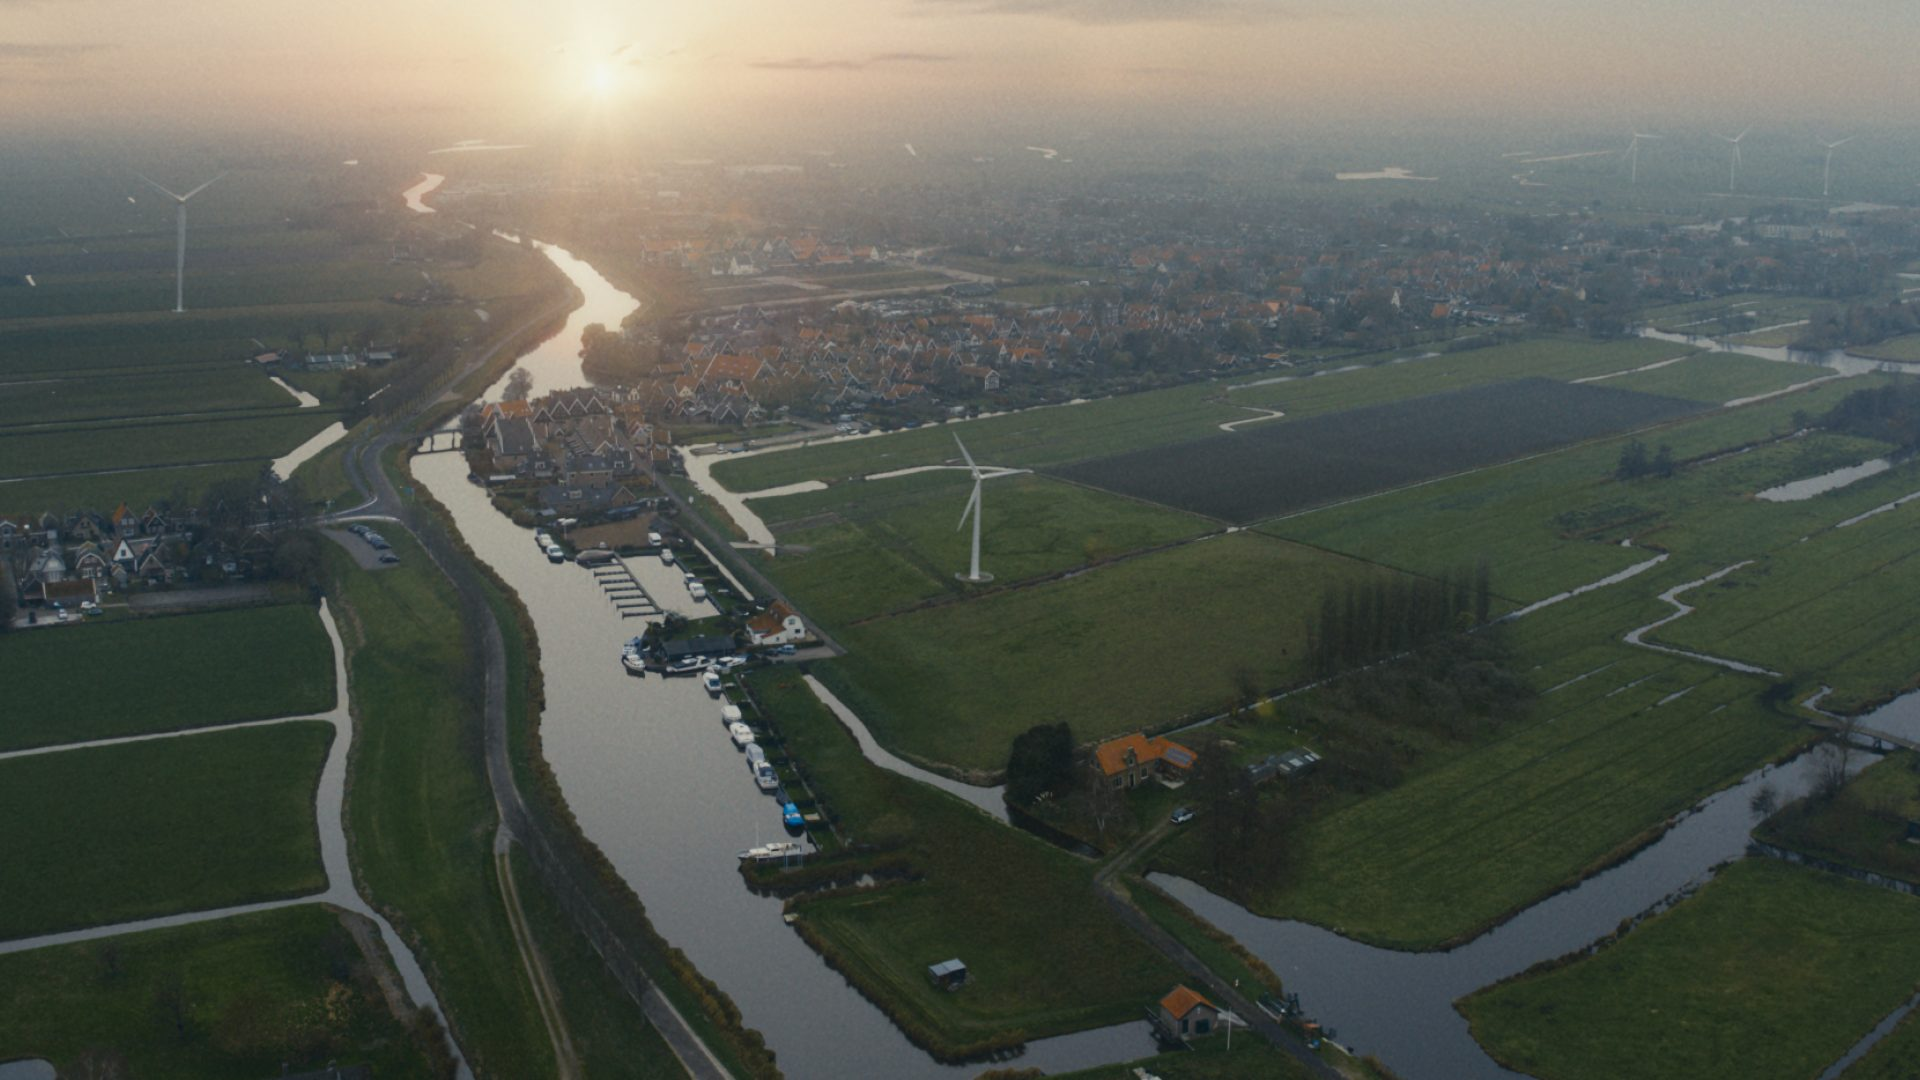 Eneco 16X9 Heel Nederland Schakelt Om Dorp 1M  29099 Generic 1397 Still003